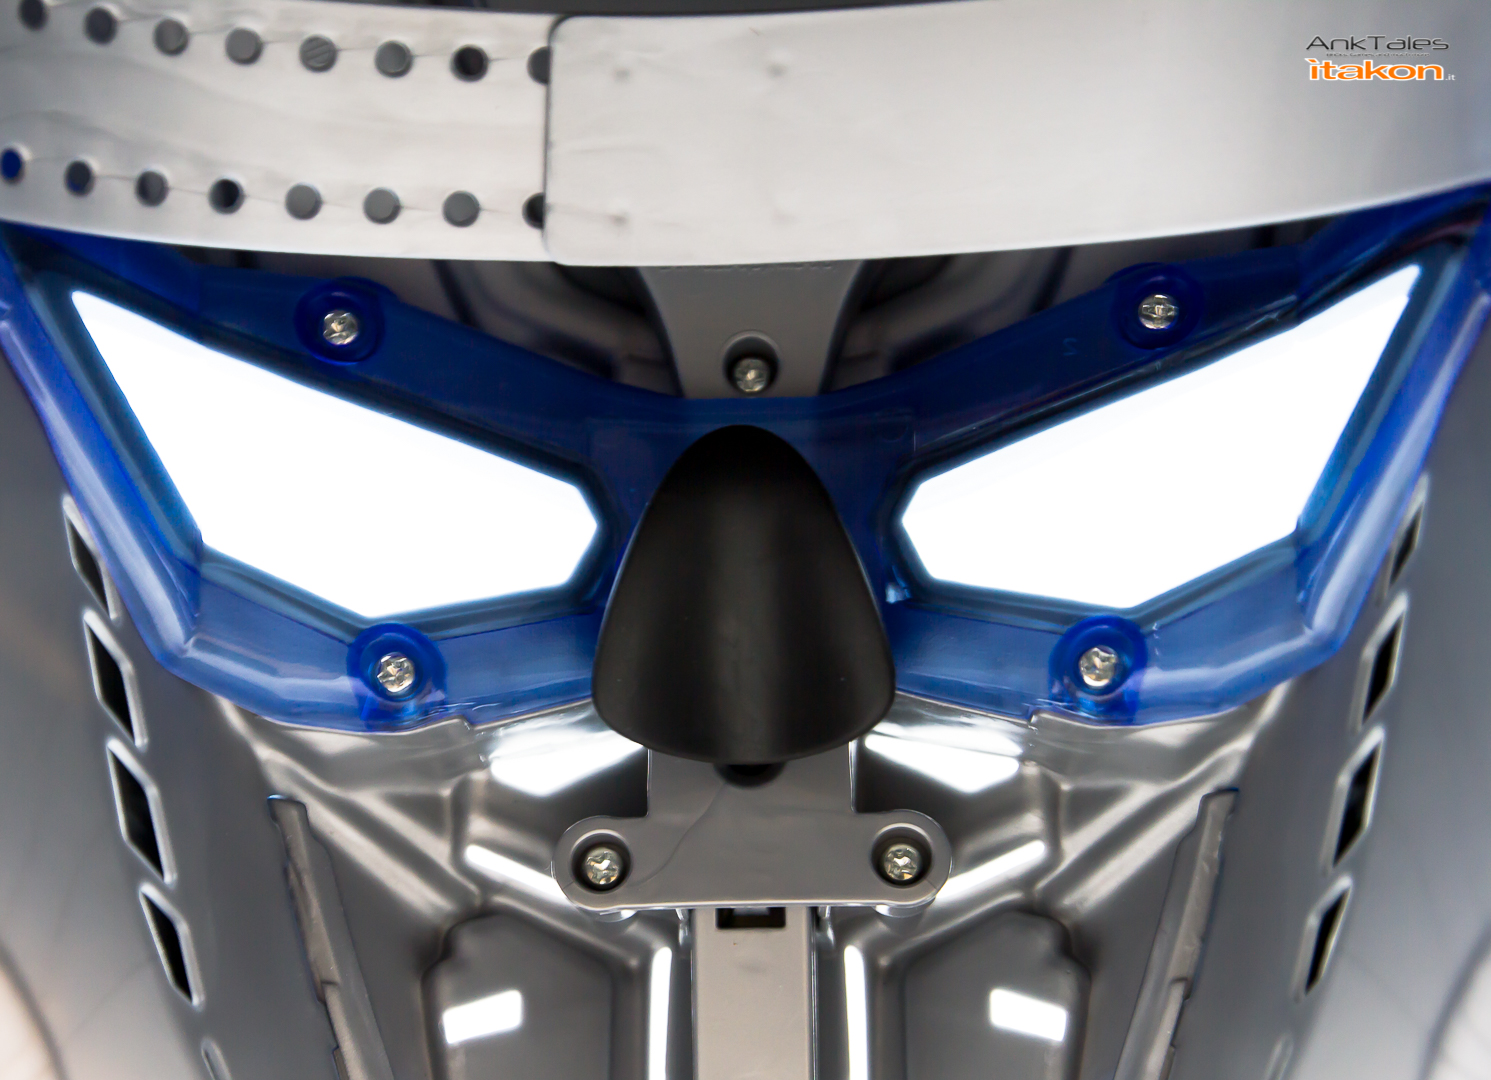 Link a Hasbro Optimus Prime helmet Anktales Itakon_0036